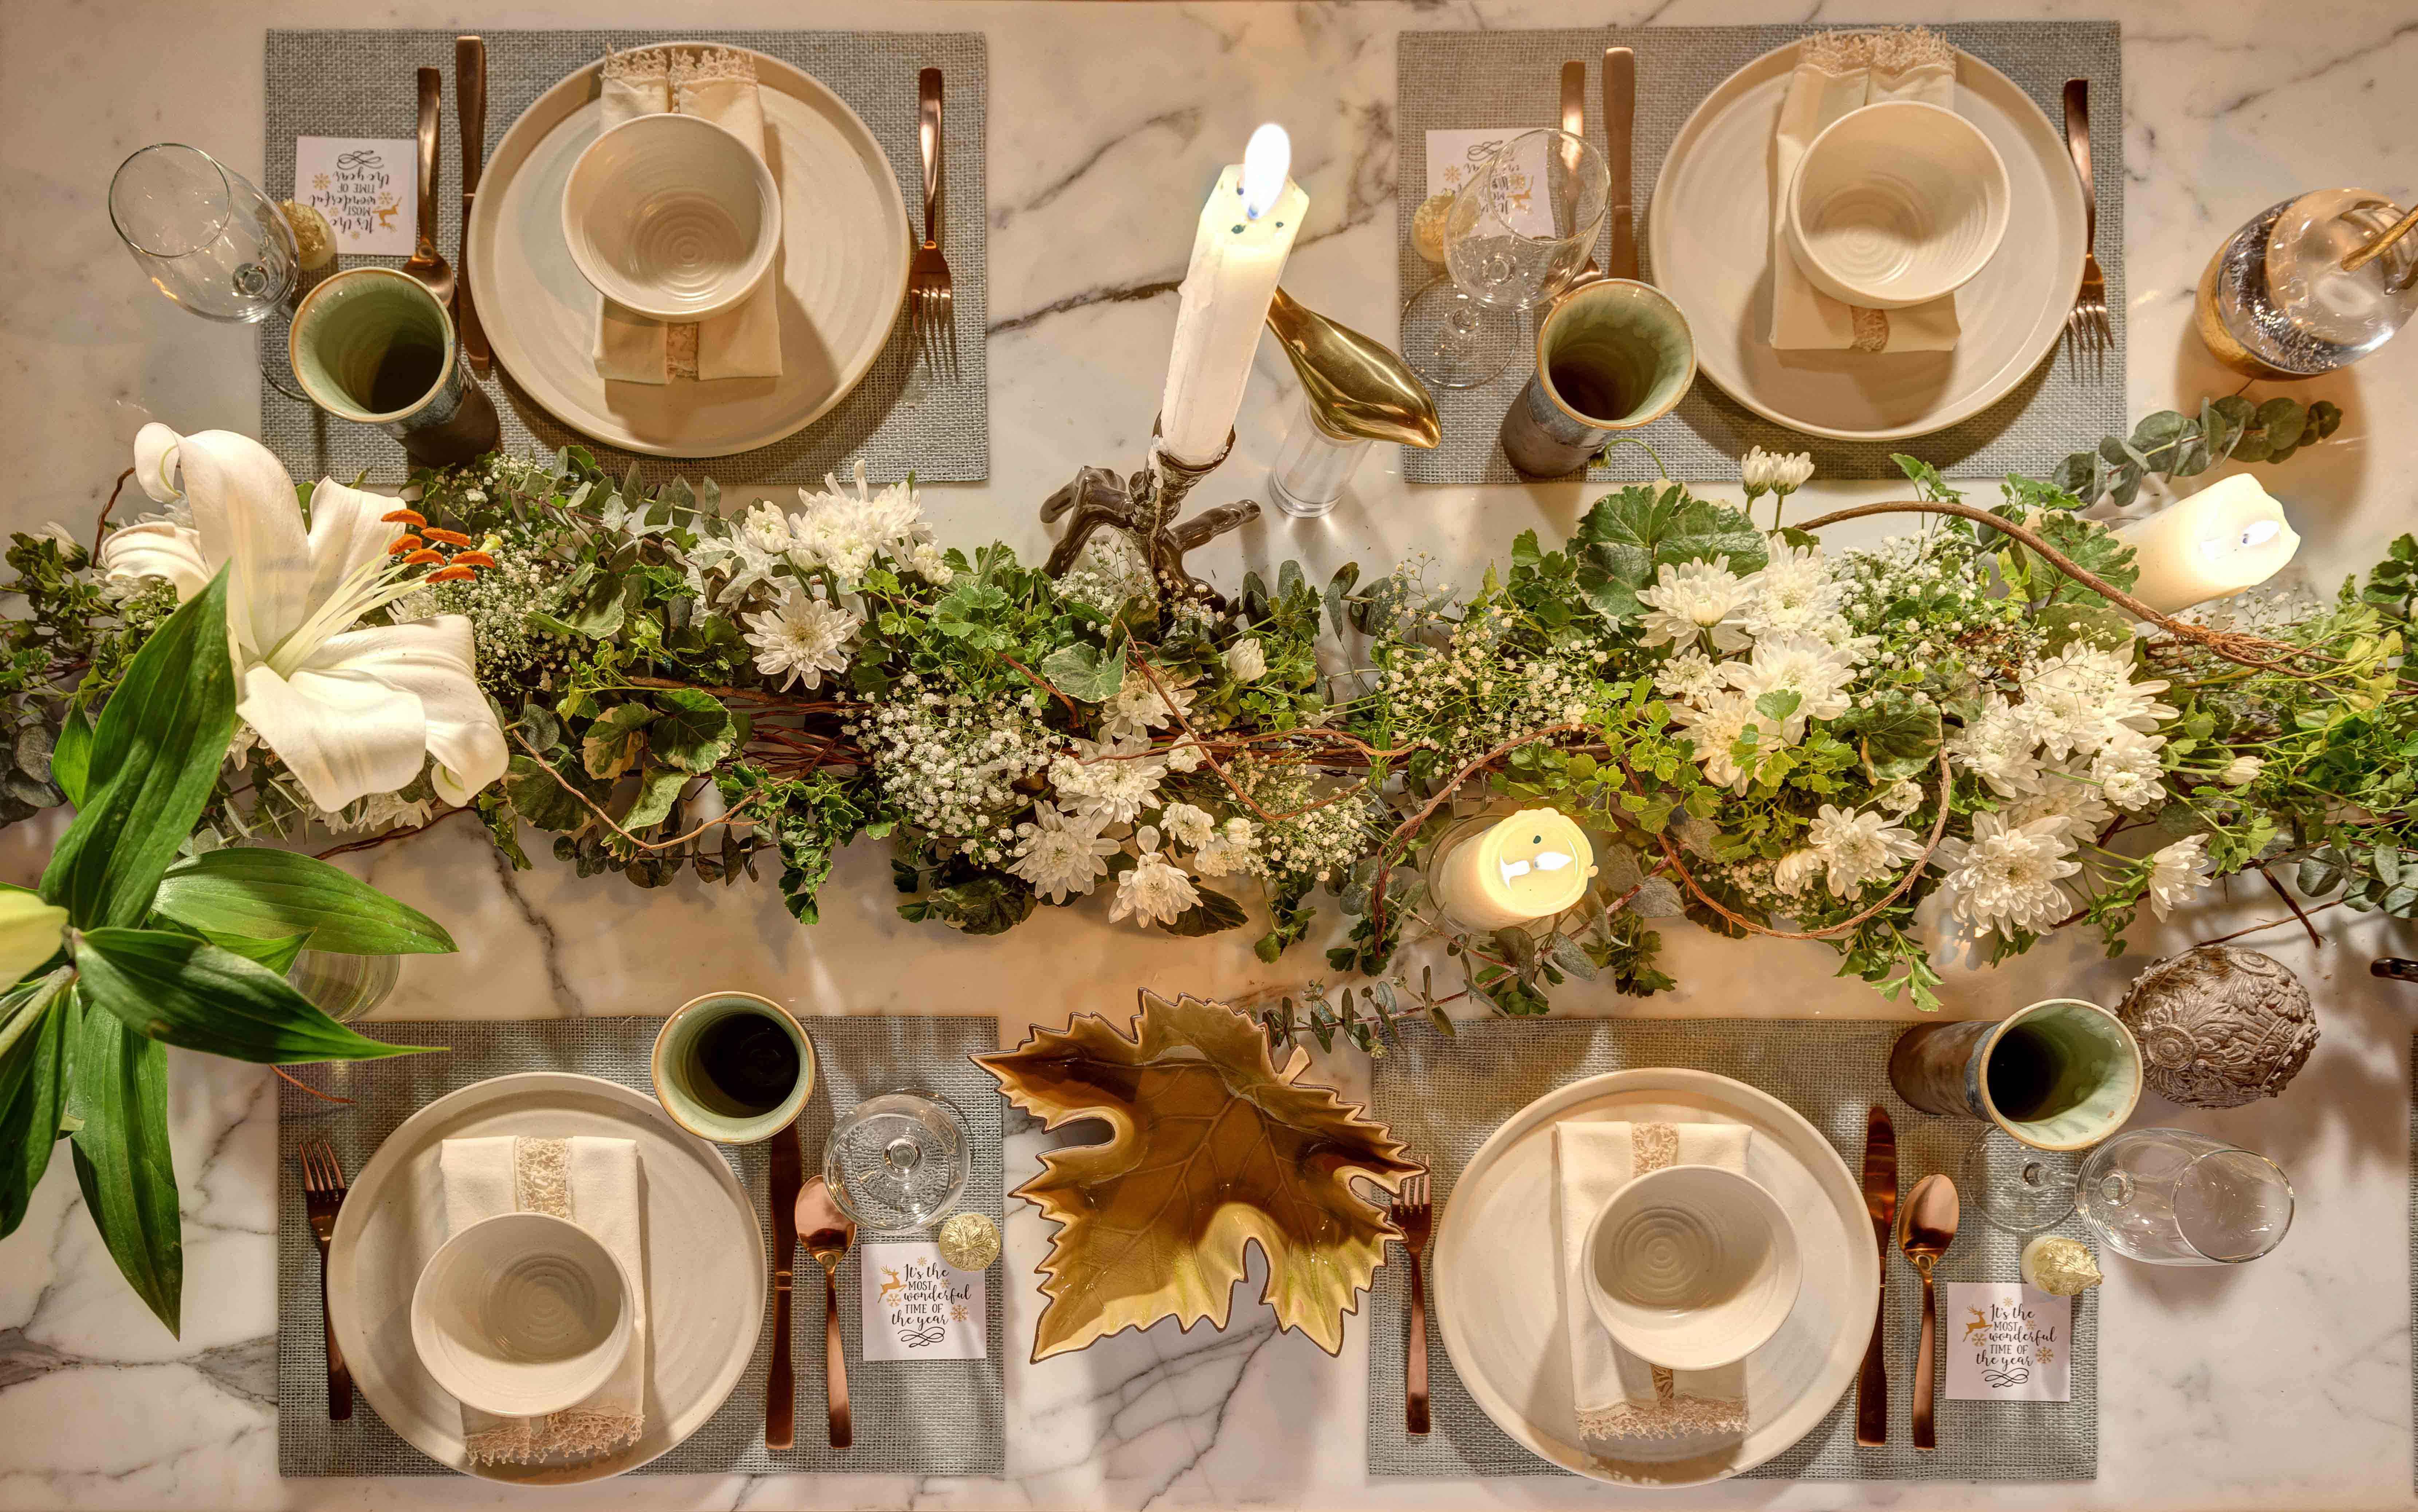 Everyday Table Setting Ideas